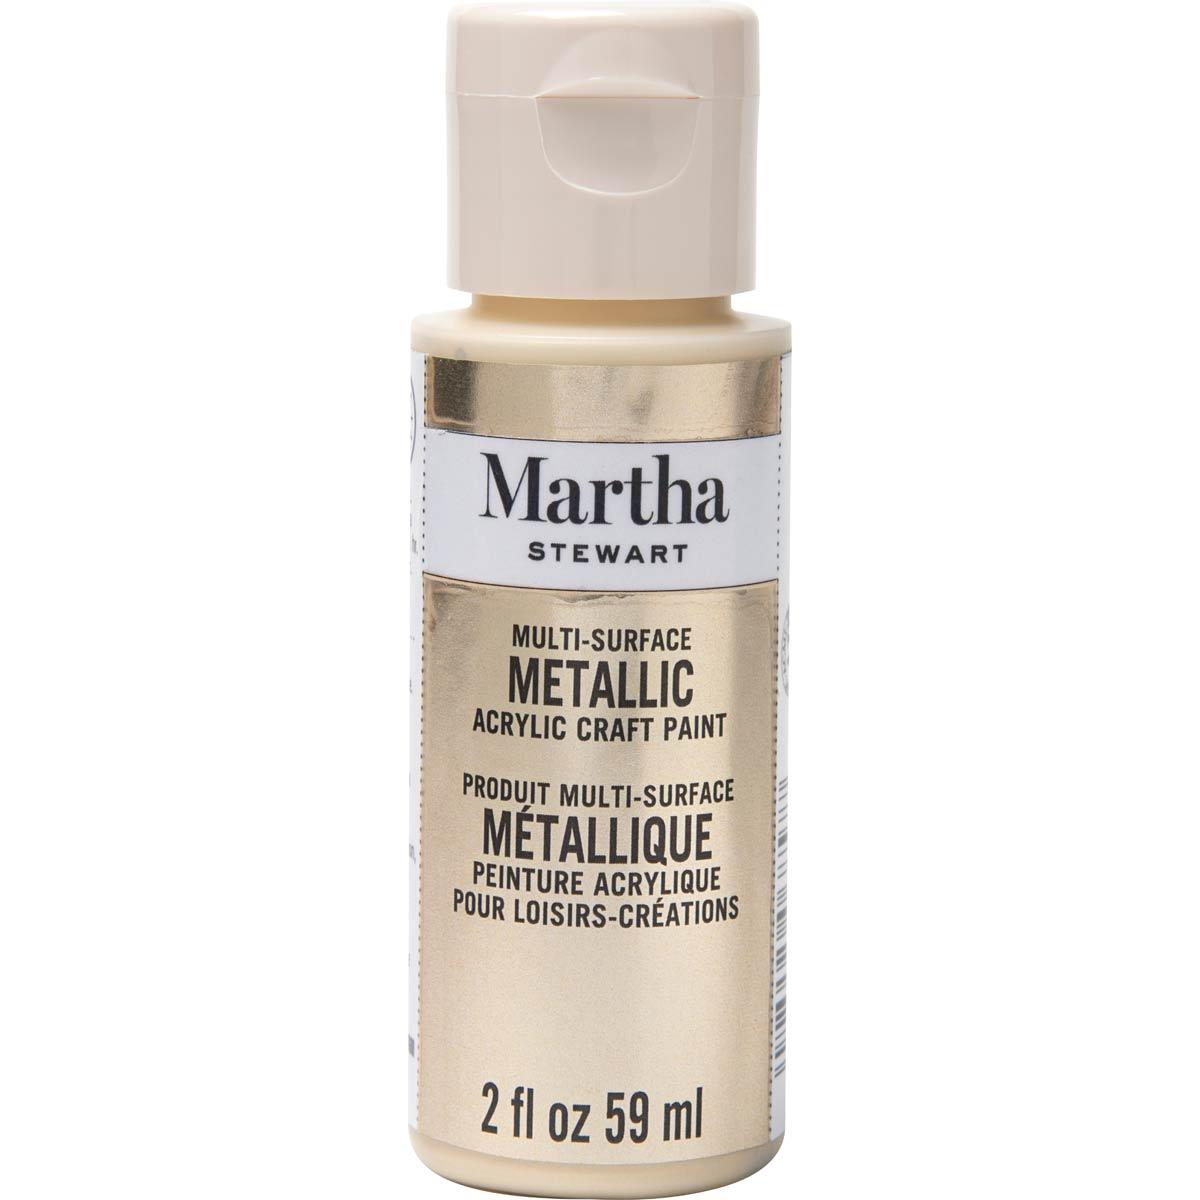 Martha Stewart ® Multi-Surface Metallic Acrylic Craft Paint - Light Gold, 2 oz. - 32996CA